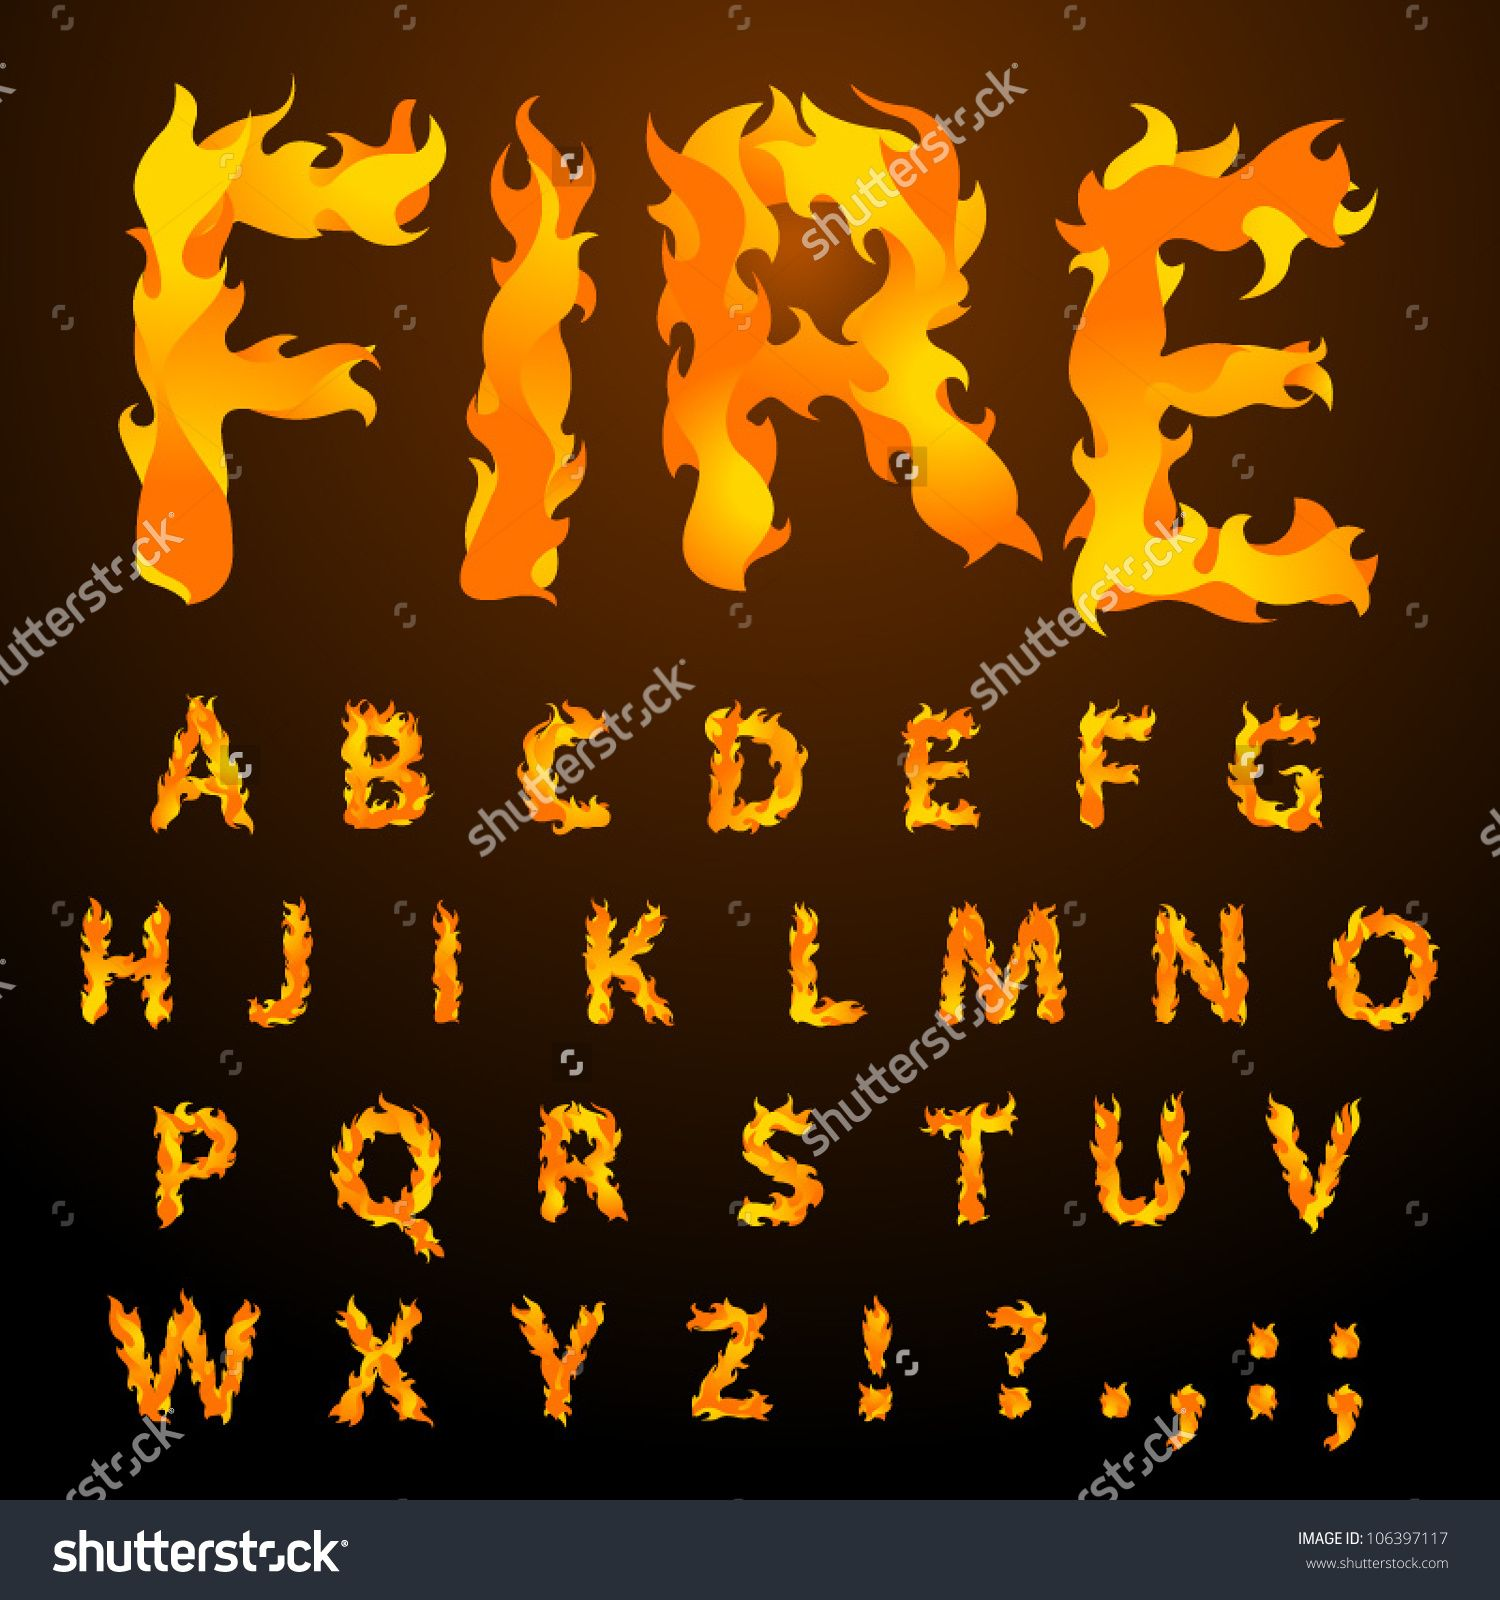 fire font r flames Google Search Crafts Pinterest